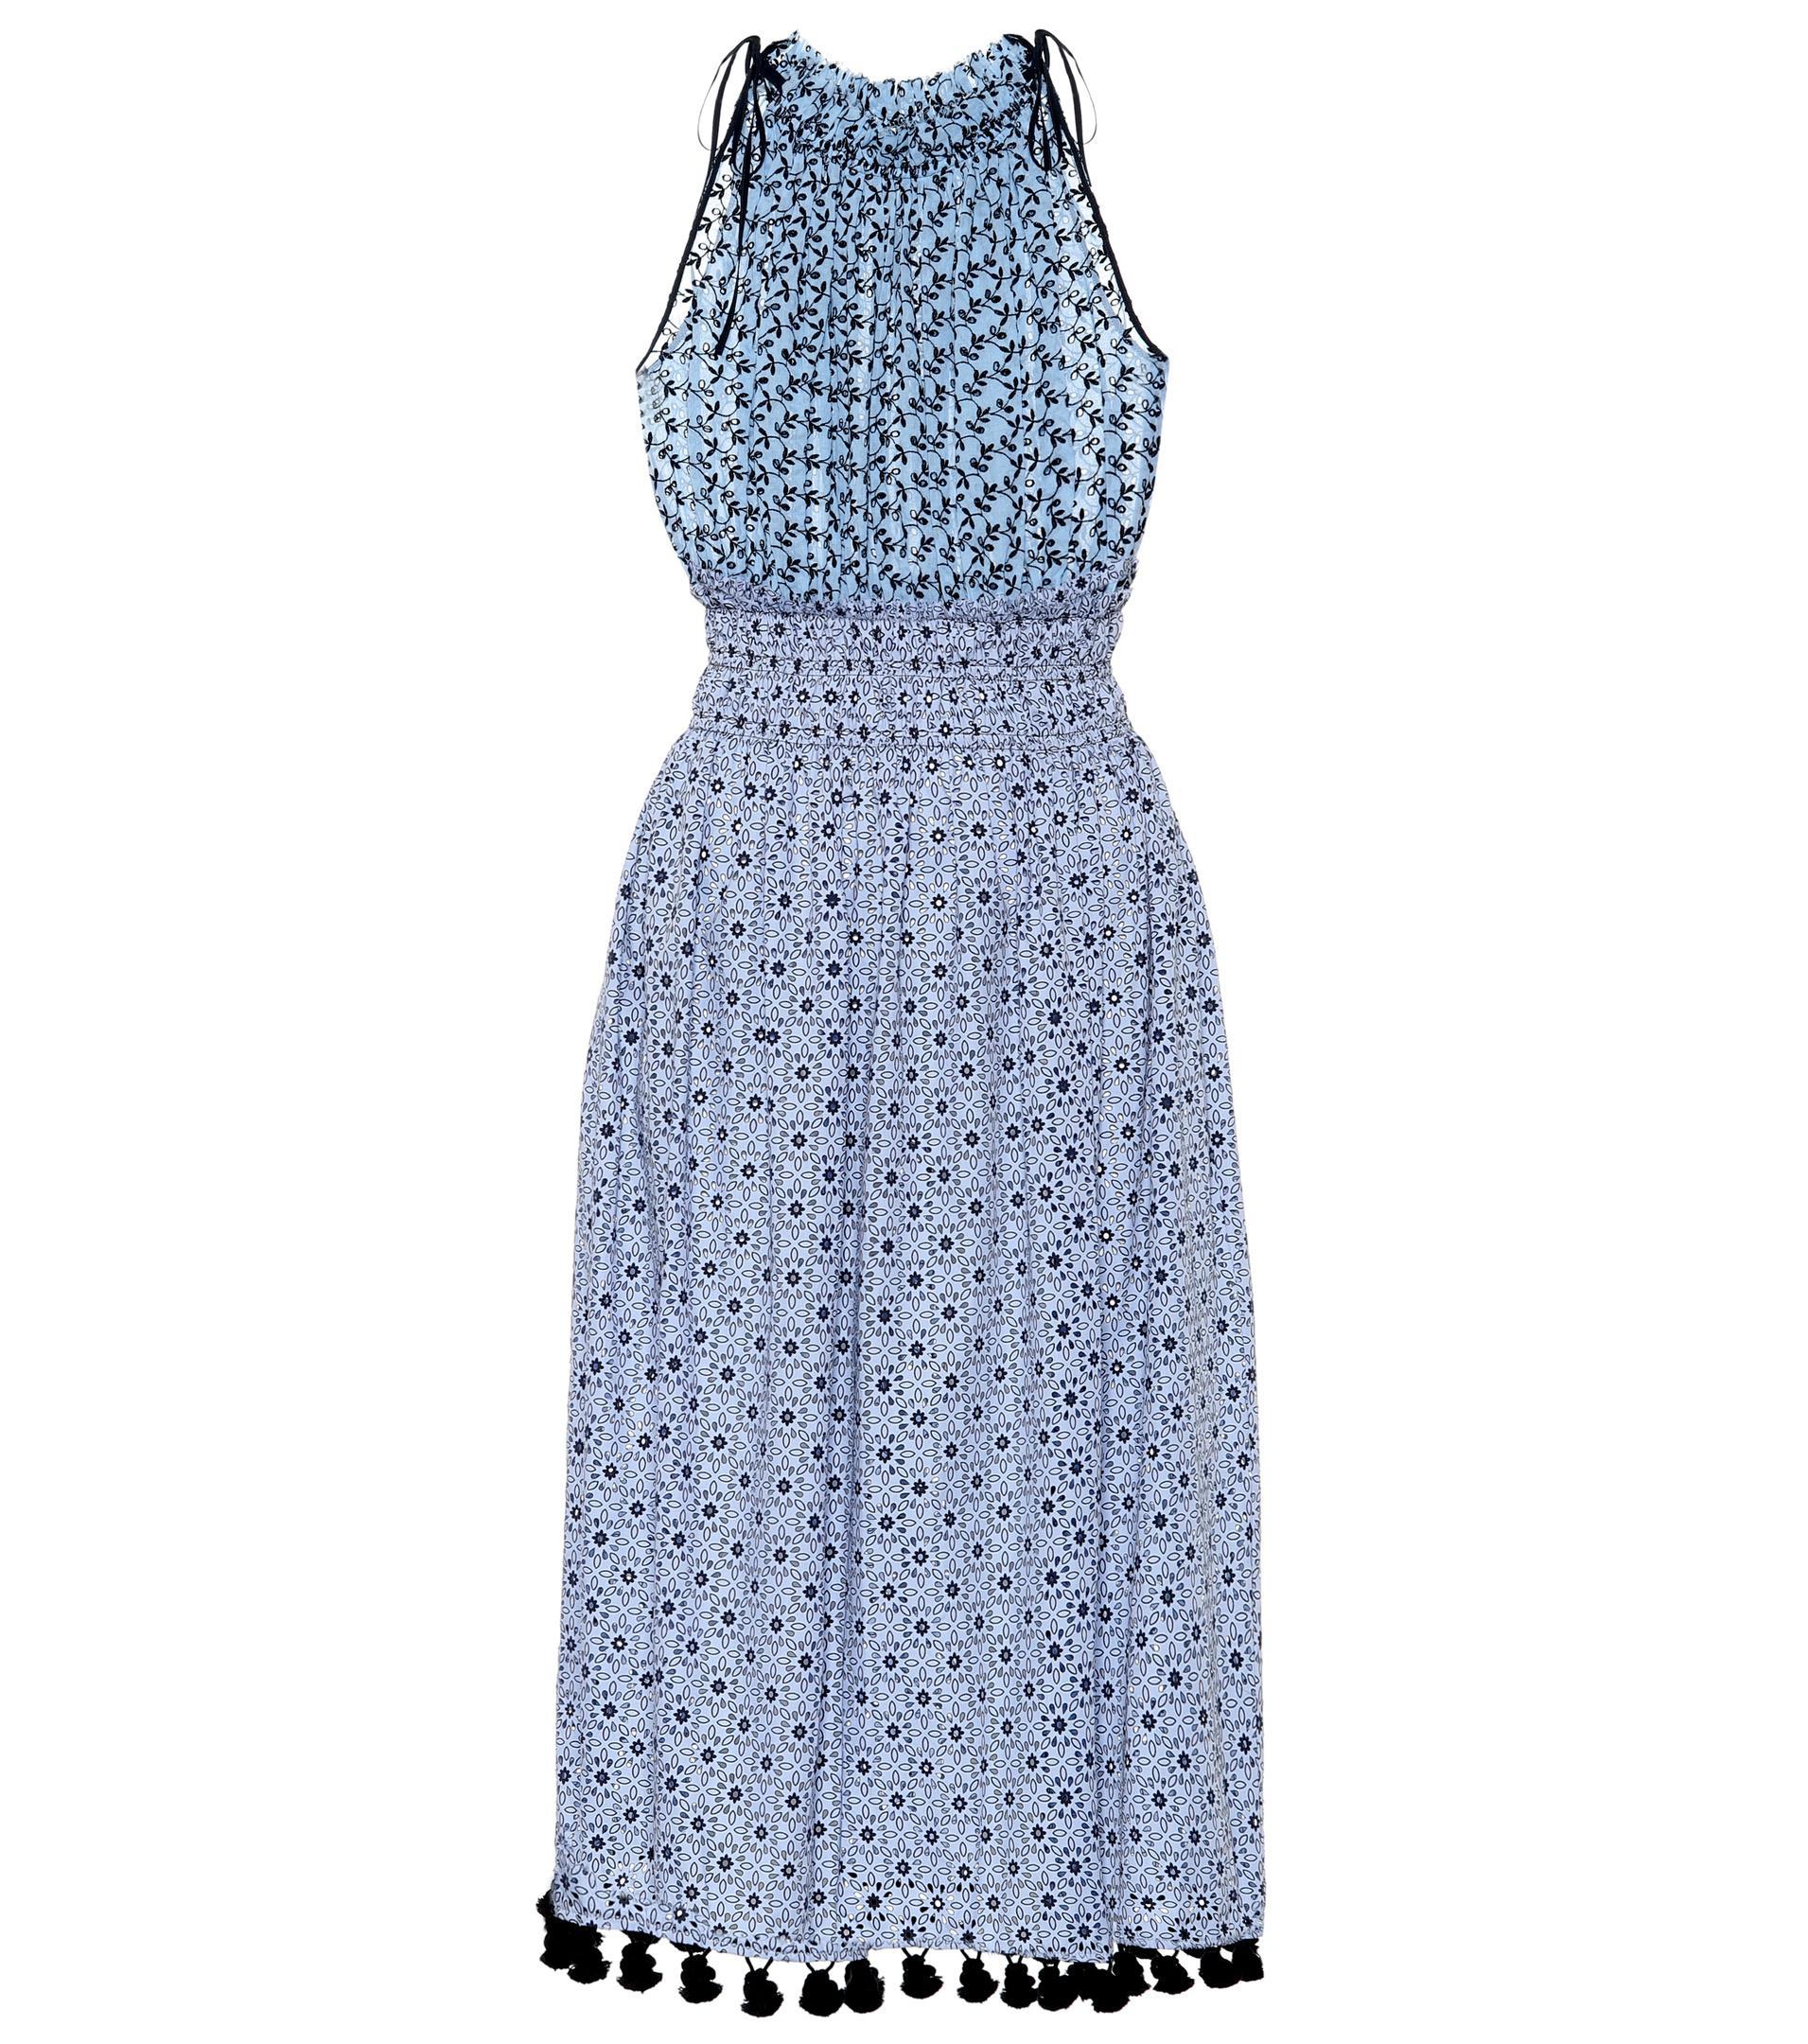 Sleeveless printed cotton dress Altuzarra CJUW5QfG7i